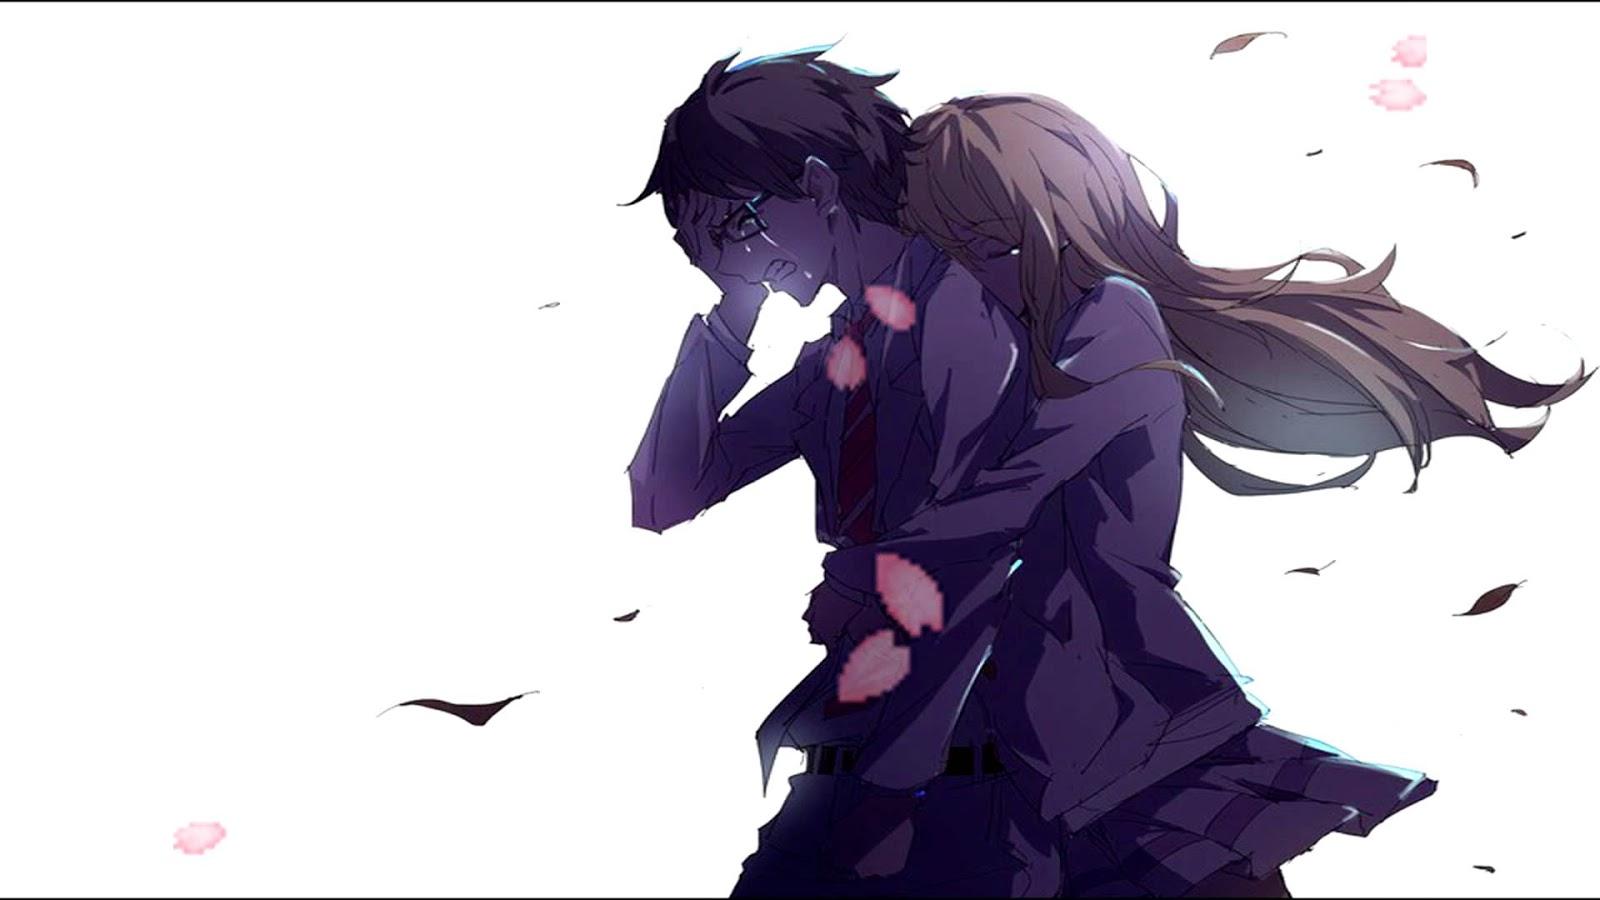 Hai Sobat Aliansiku Pak Kabar Apakah Kalian Sedang Sengang Baca Postingan Ini Yak Kali Admin Bakalan Share Anime Dengan Ending Atau Adegannya